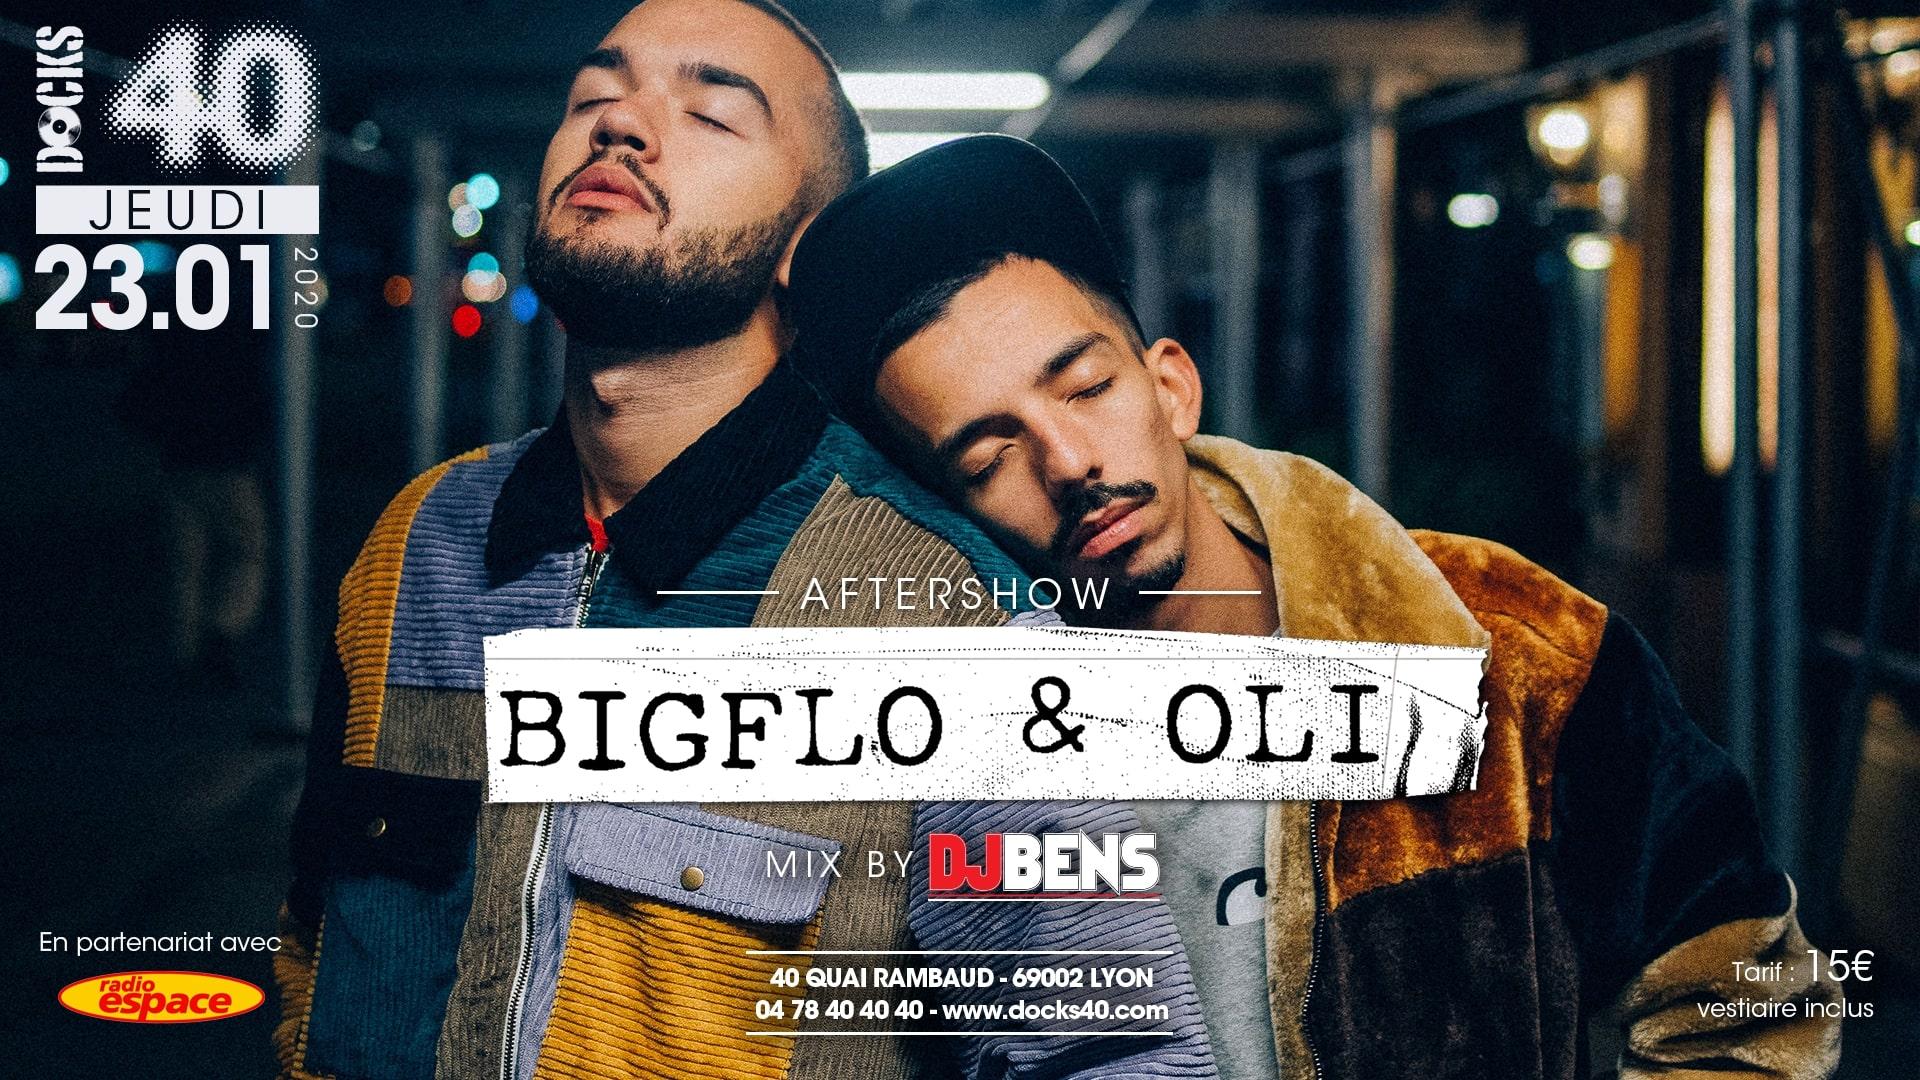 AFTERSHOW BigFlo et Oli DJ Bens